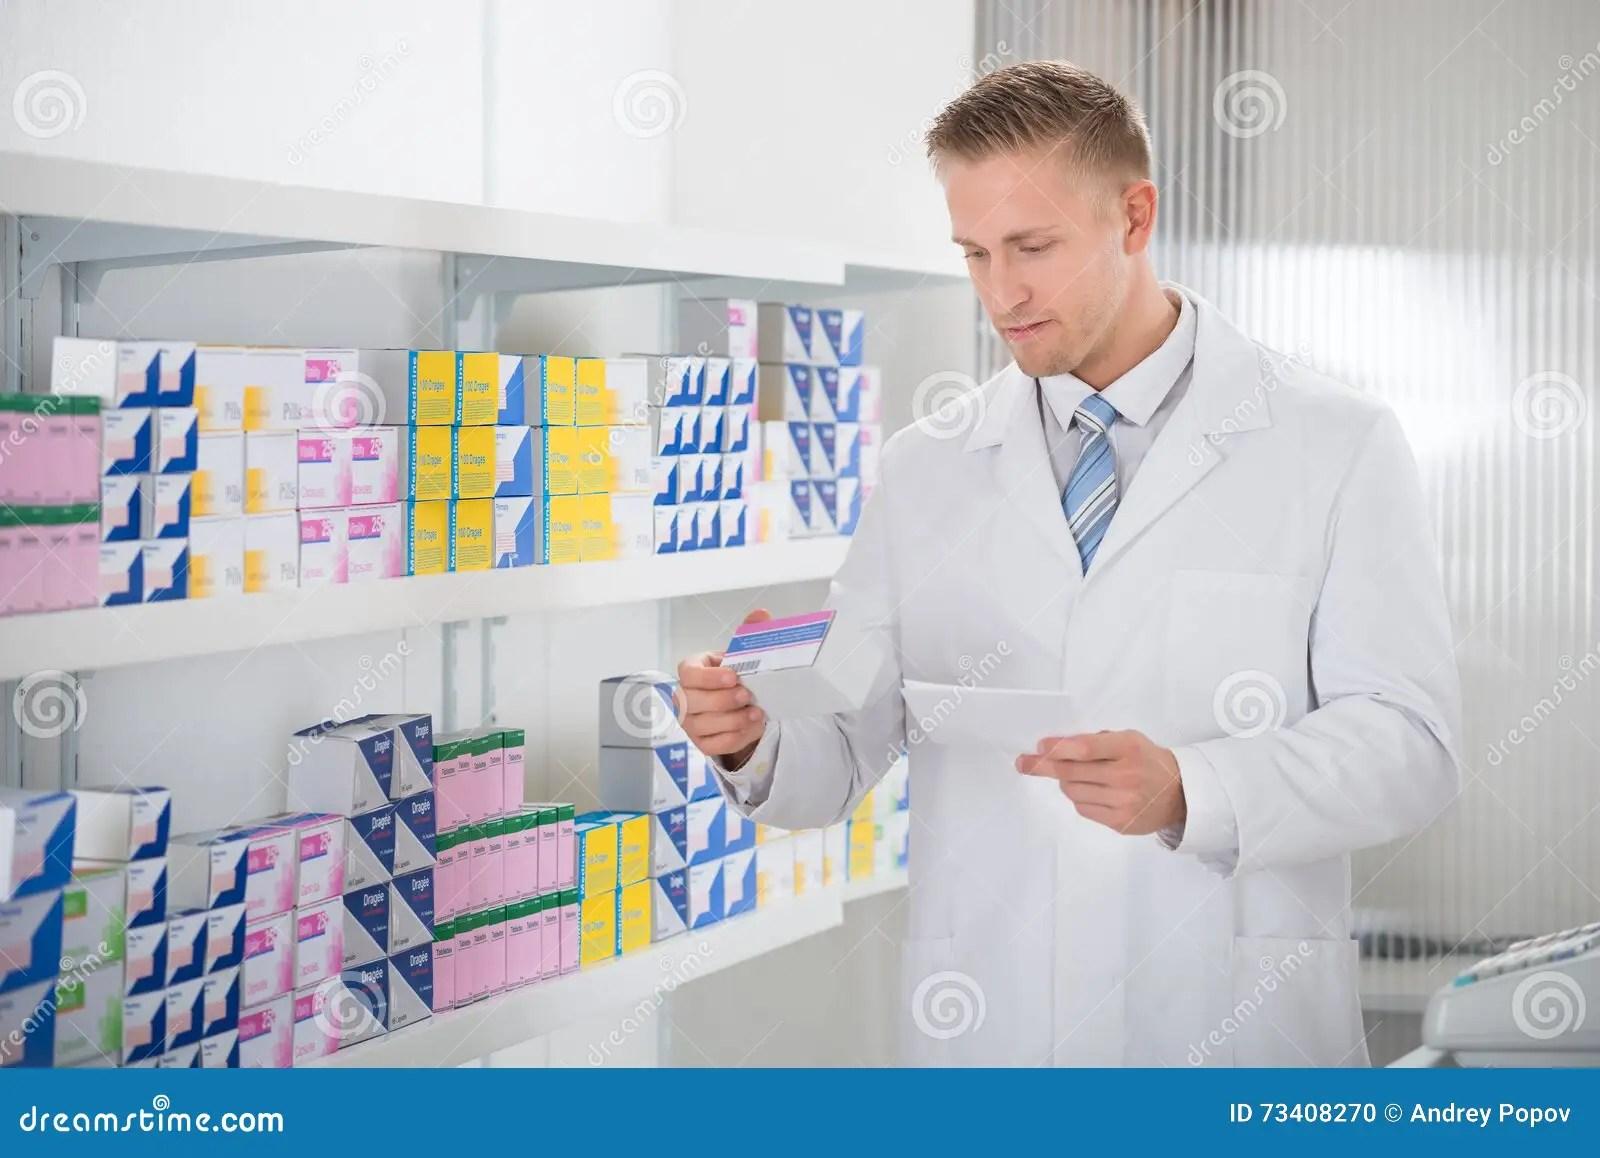 Pharmacist Reading Label On Medicine Stock Photo